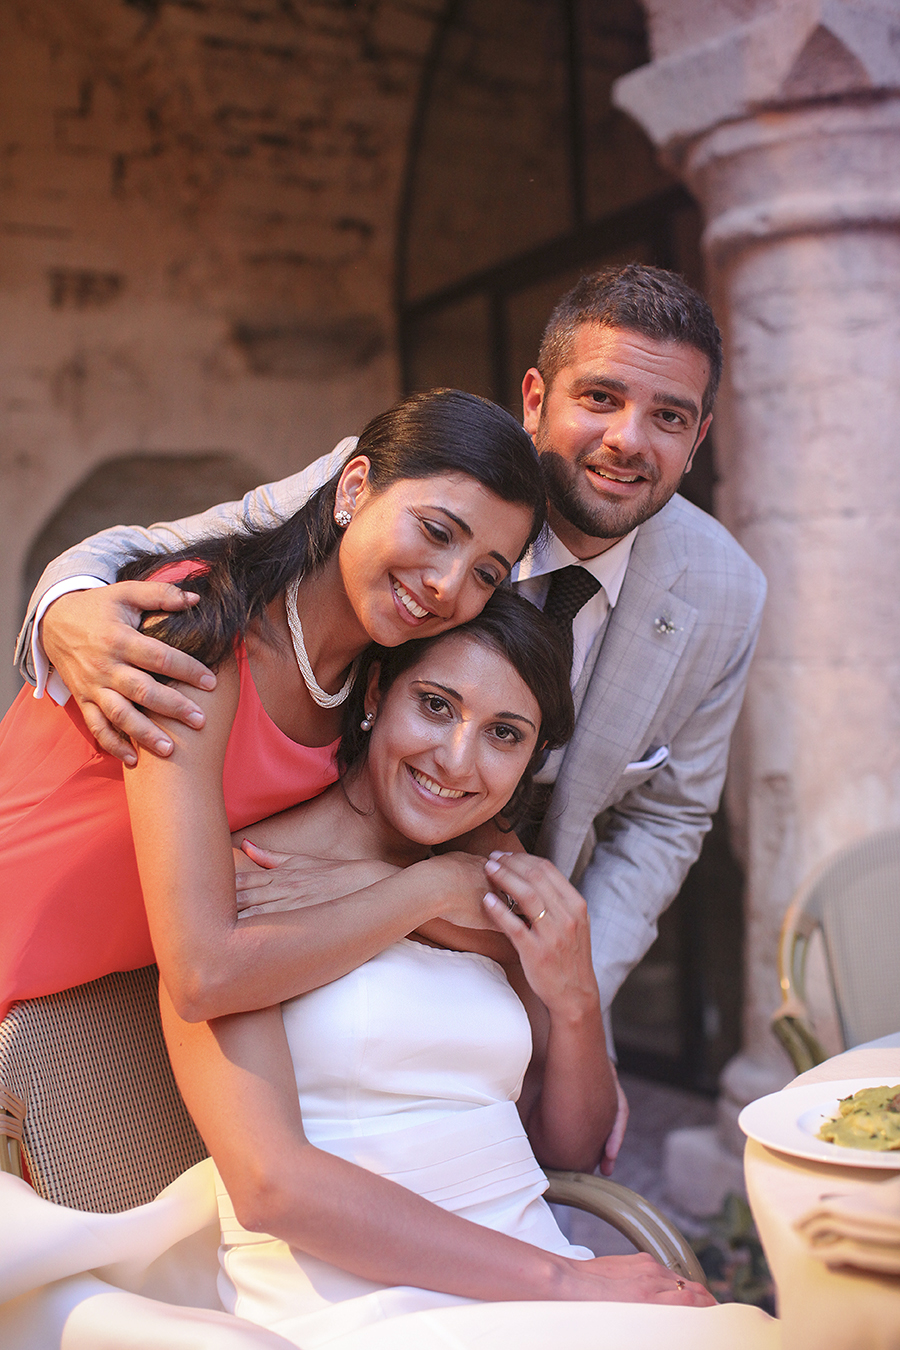 italy wedding photography by kurt ahs . alex + silvia ( washington united states ) . 7404.jpg